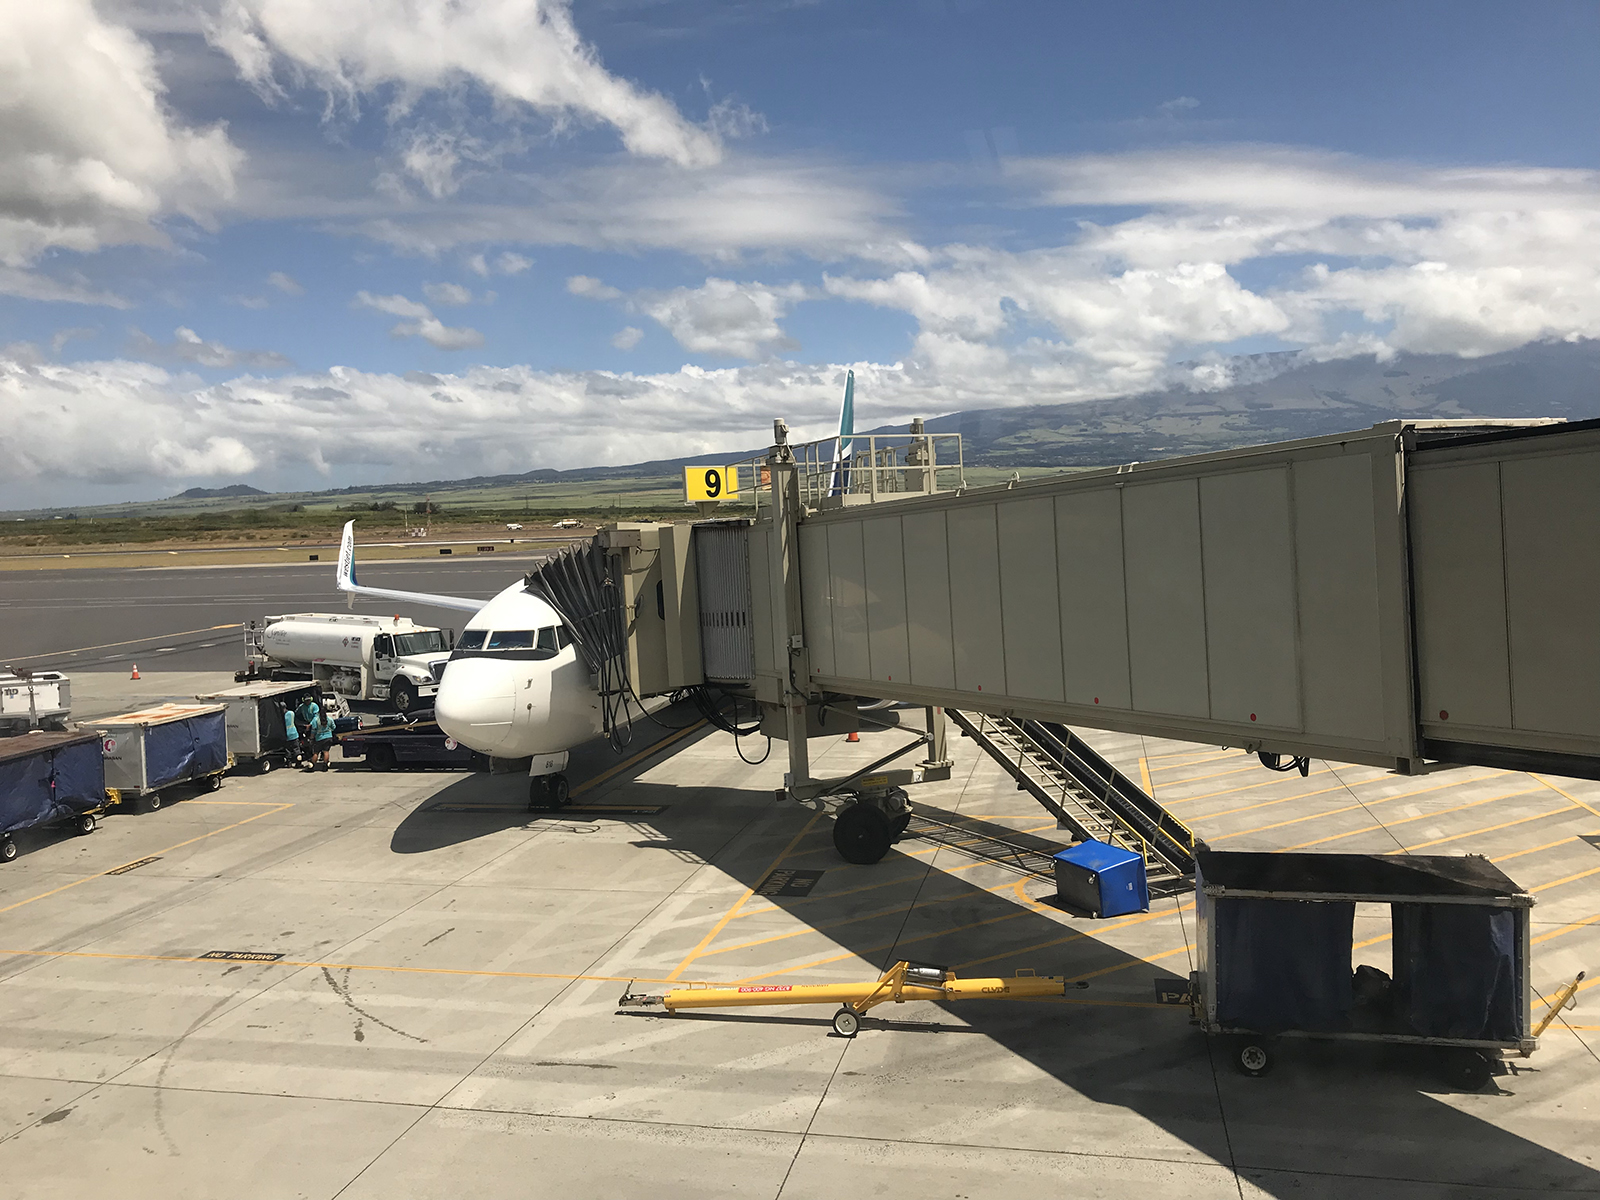 Kahalui airport, Maui 2019